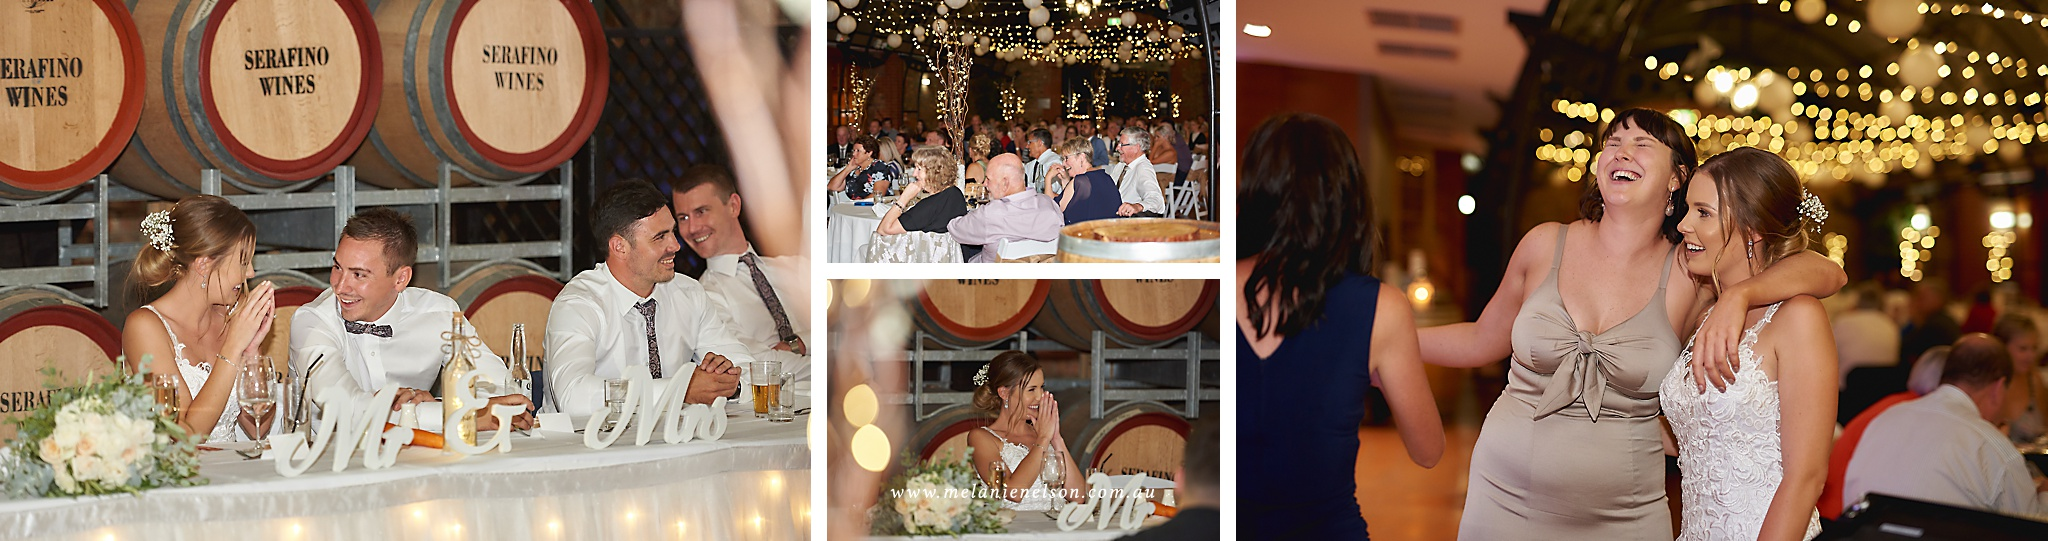 serafino_wedding_photography_0079.jpg